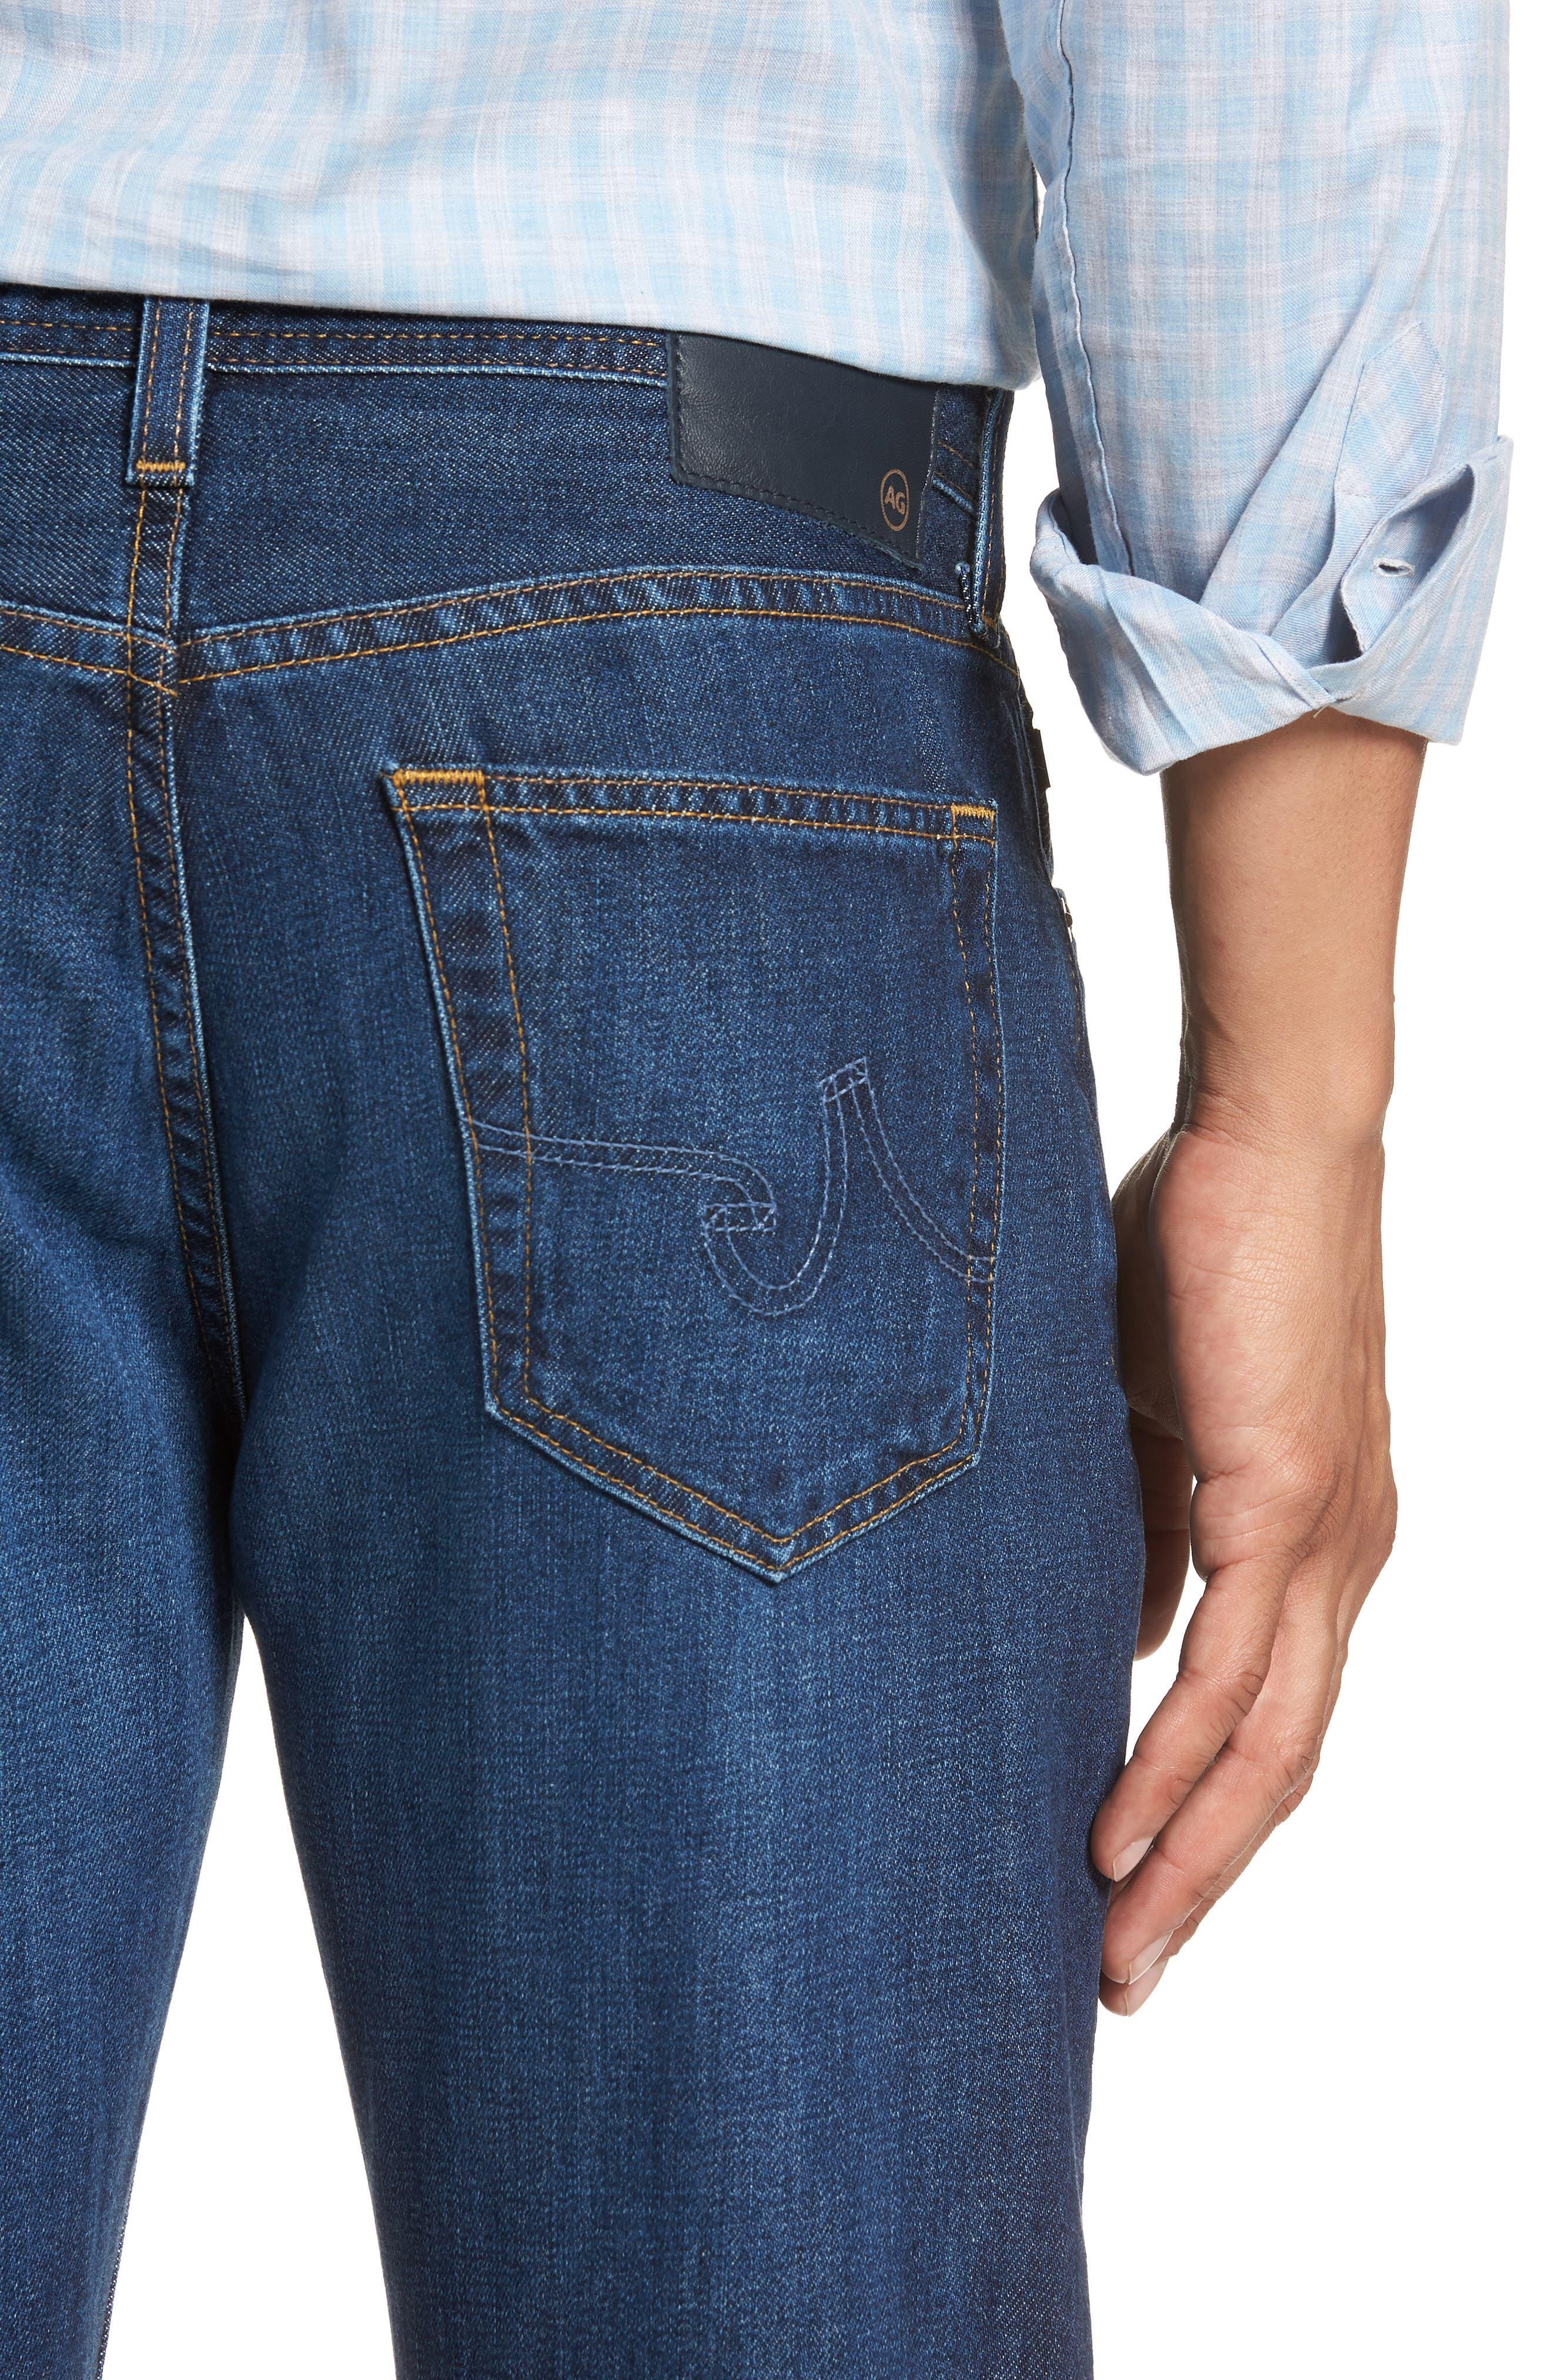 Graduate Slim Straight Leg Jeans,                             Alternate thumbnail 4, color,                             477